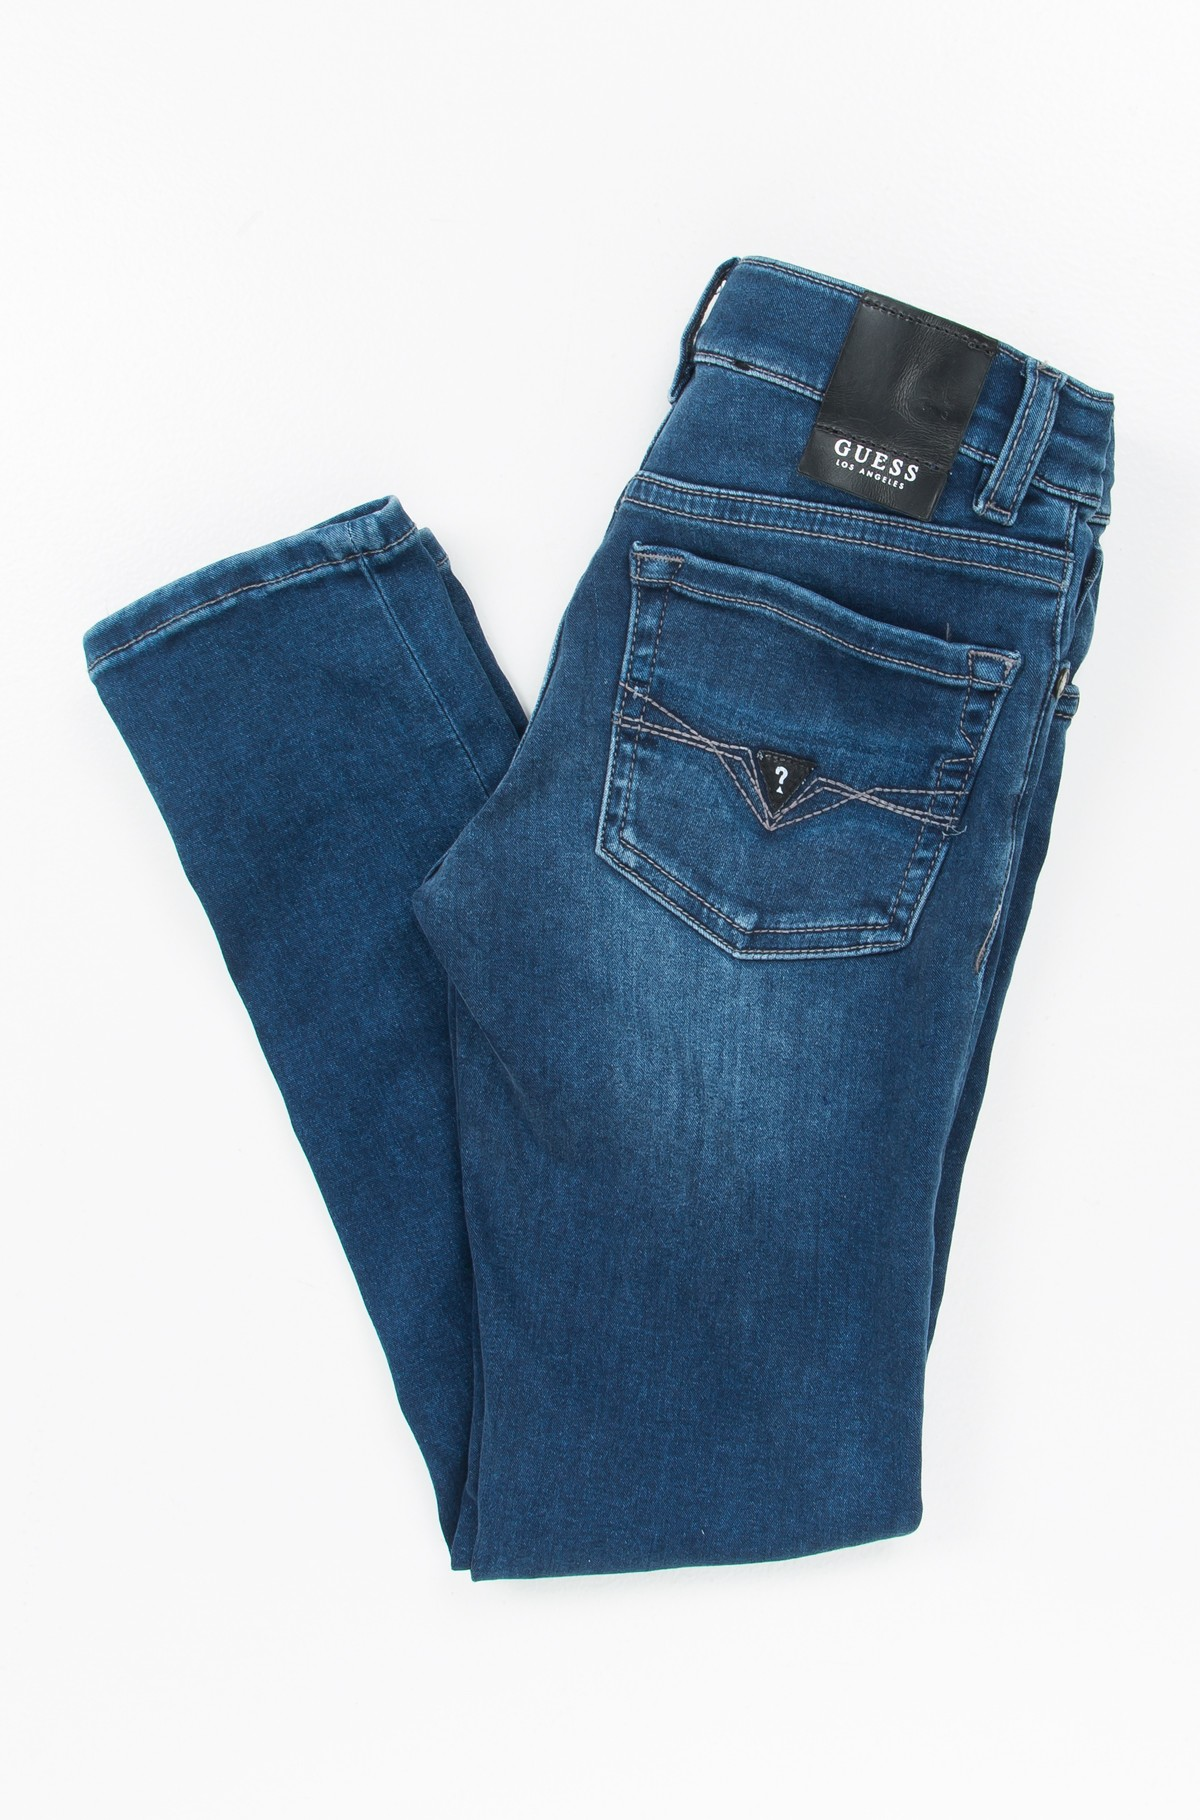 Kids jeans L74A13 D2R70-full-2